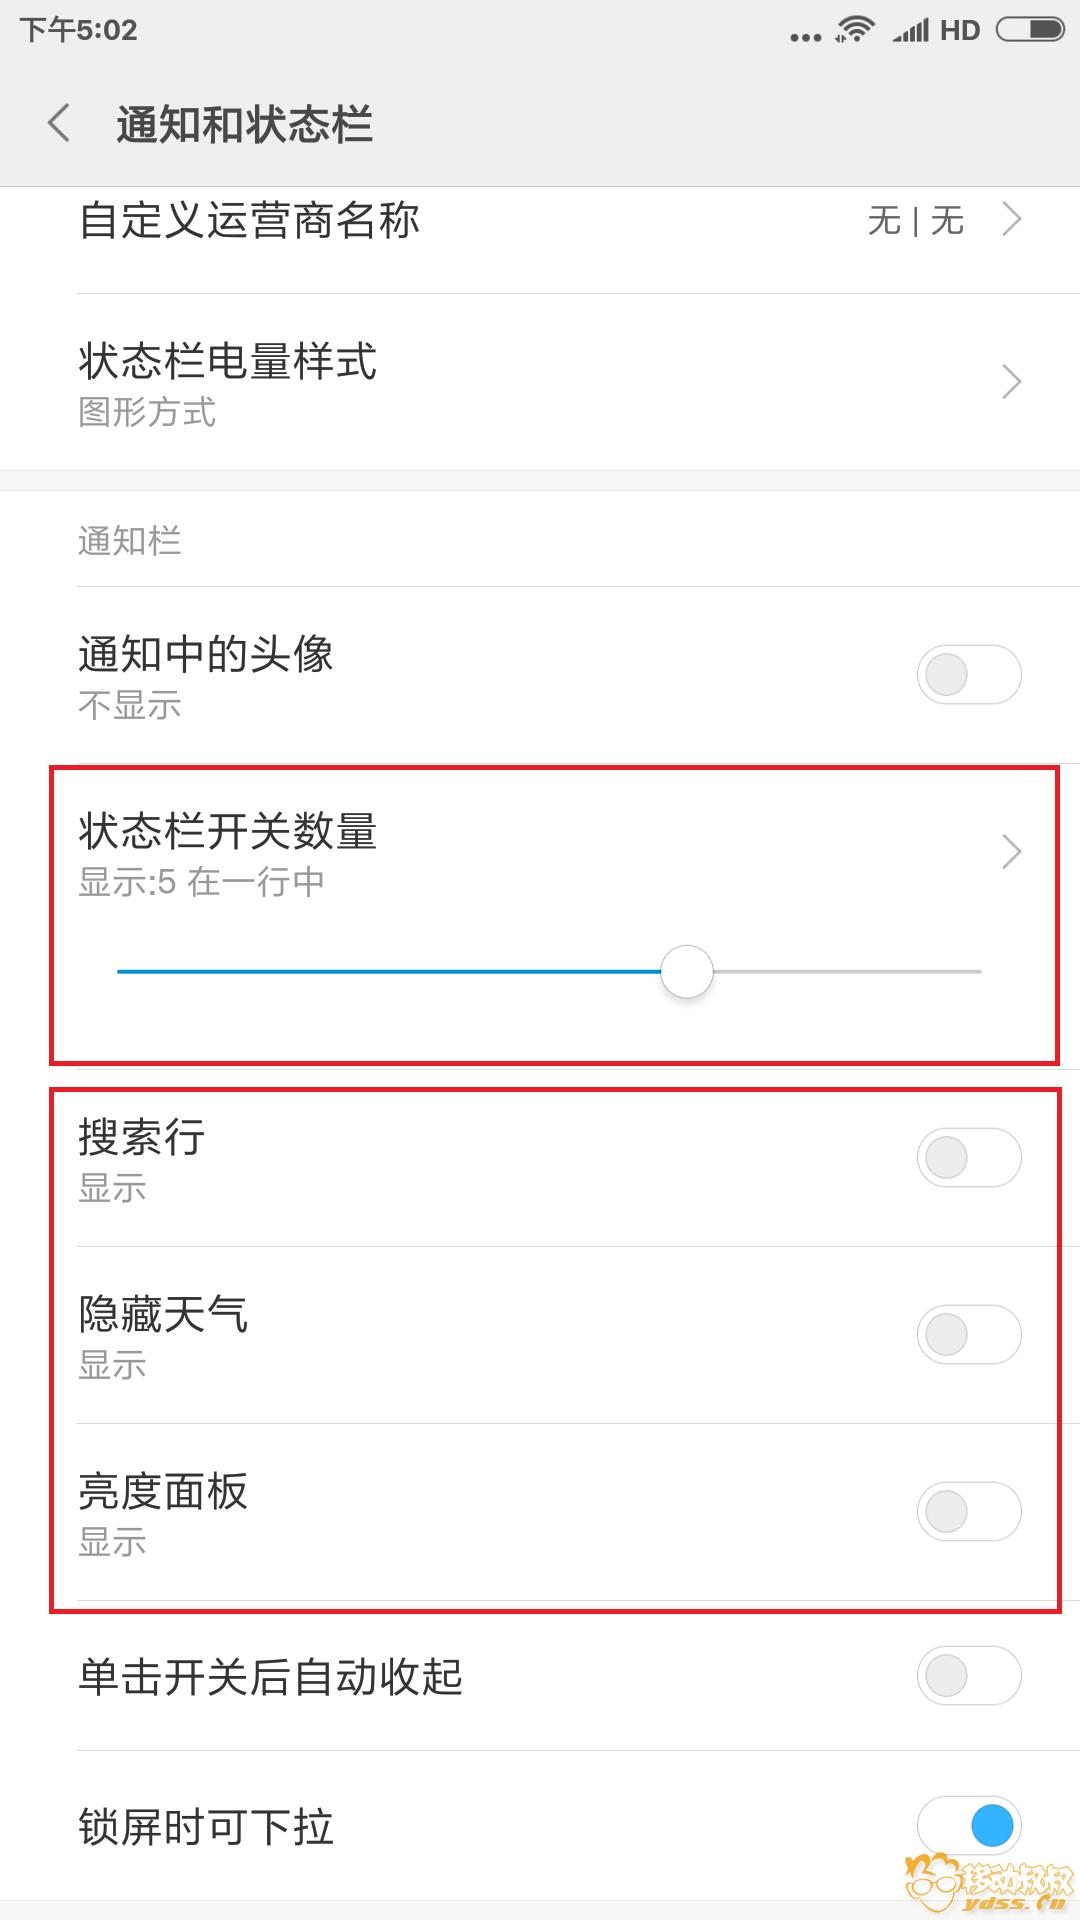 Screenshot_2018-05-19-17-02-20-406_com.android.settings.png